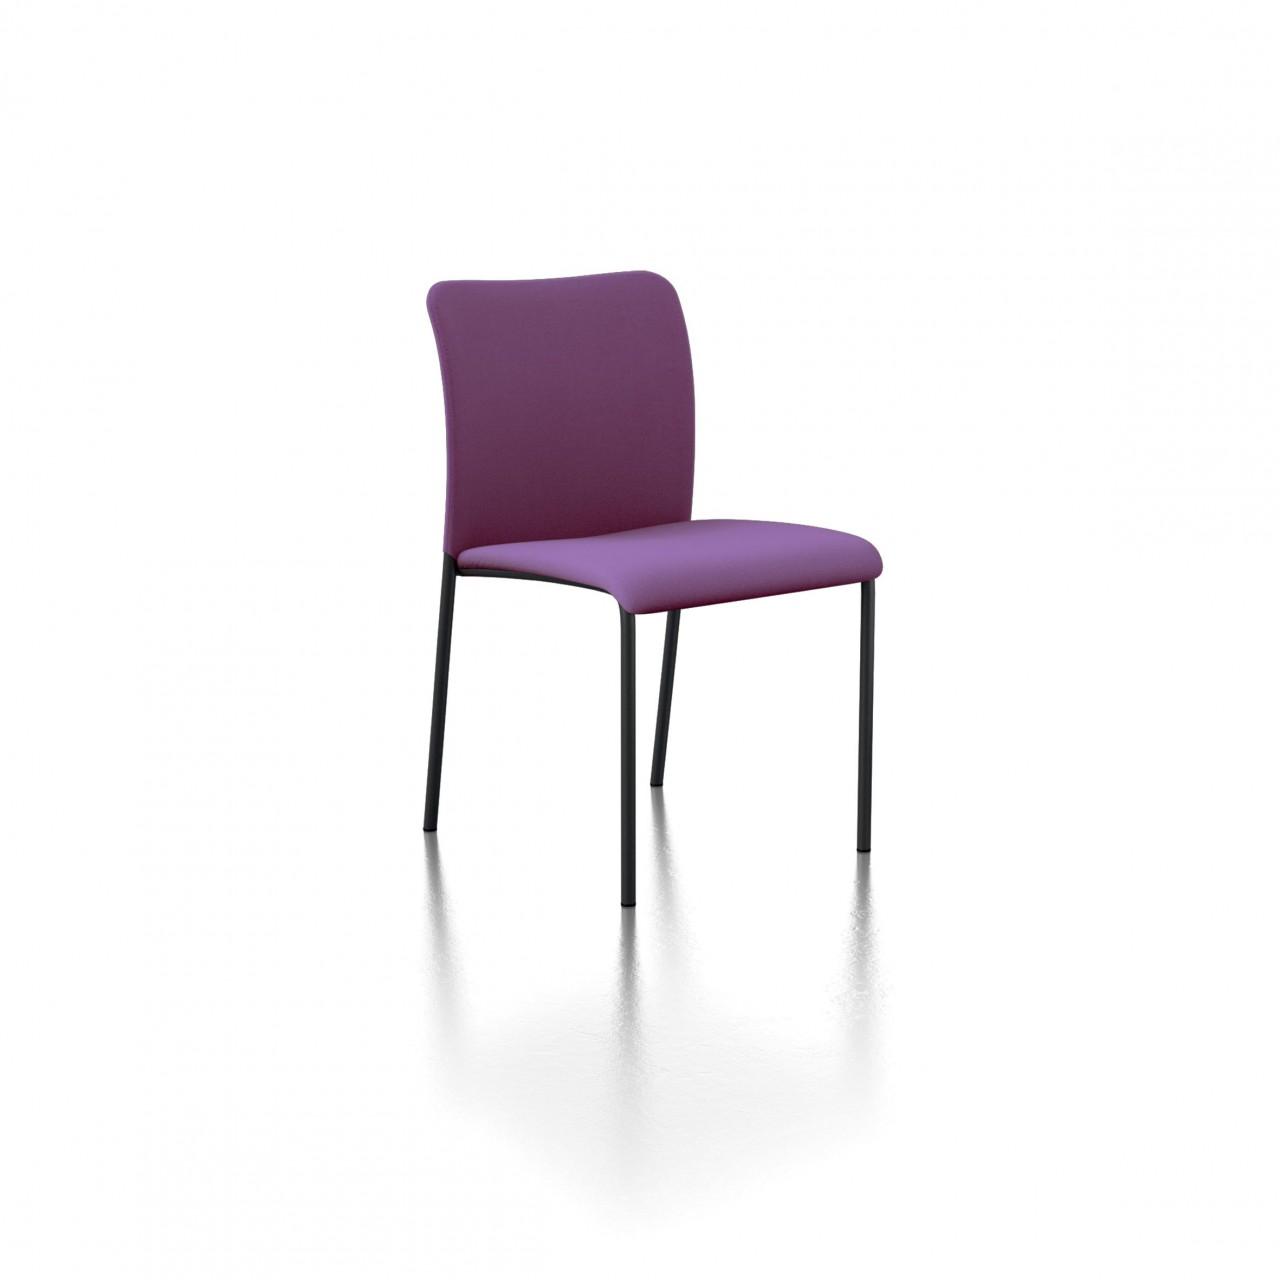 Tissu De La Reunion chaise visiteur stay dossier tissu